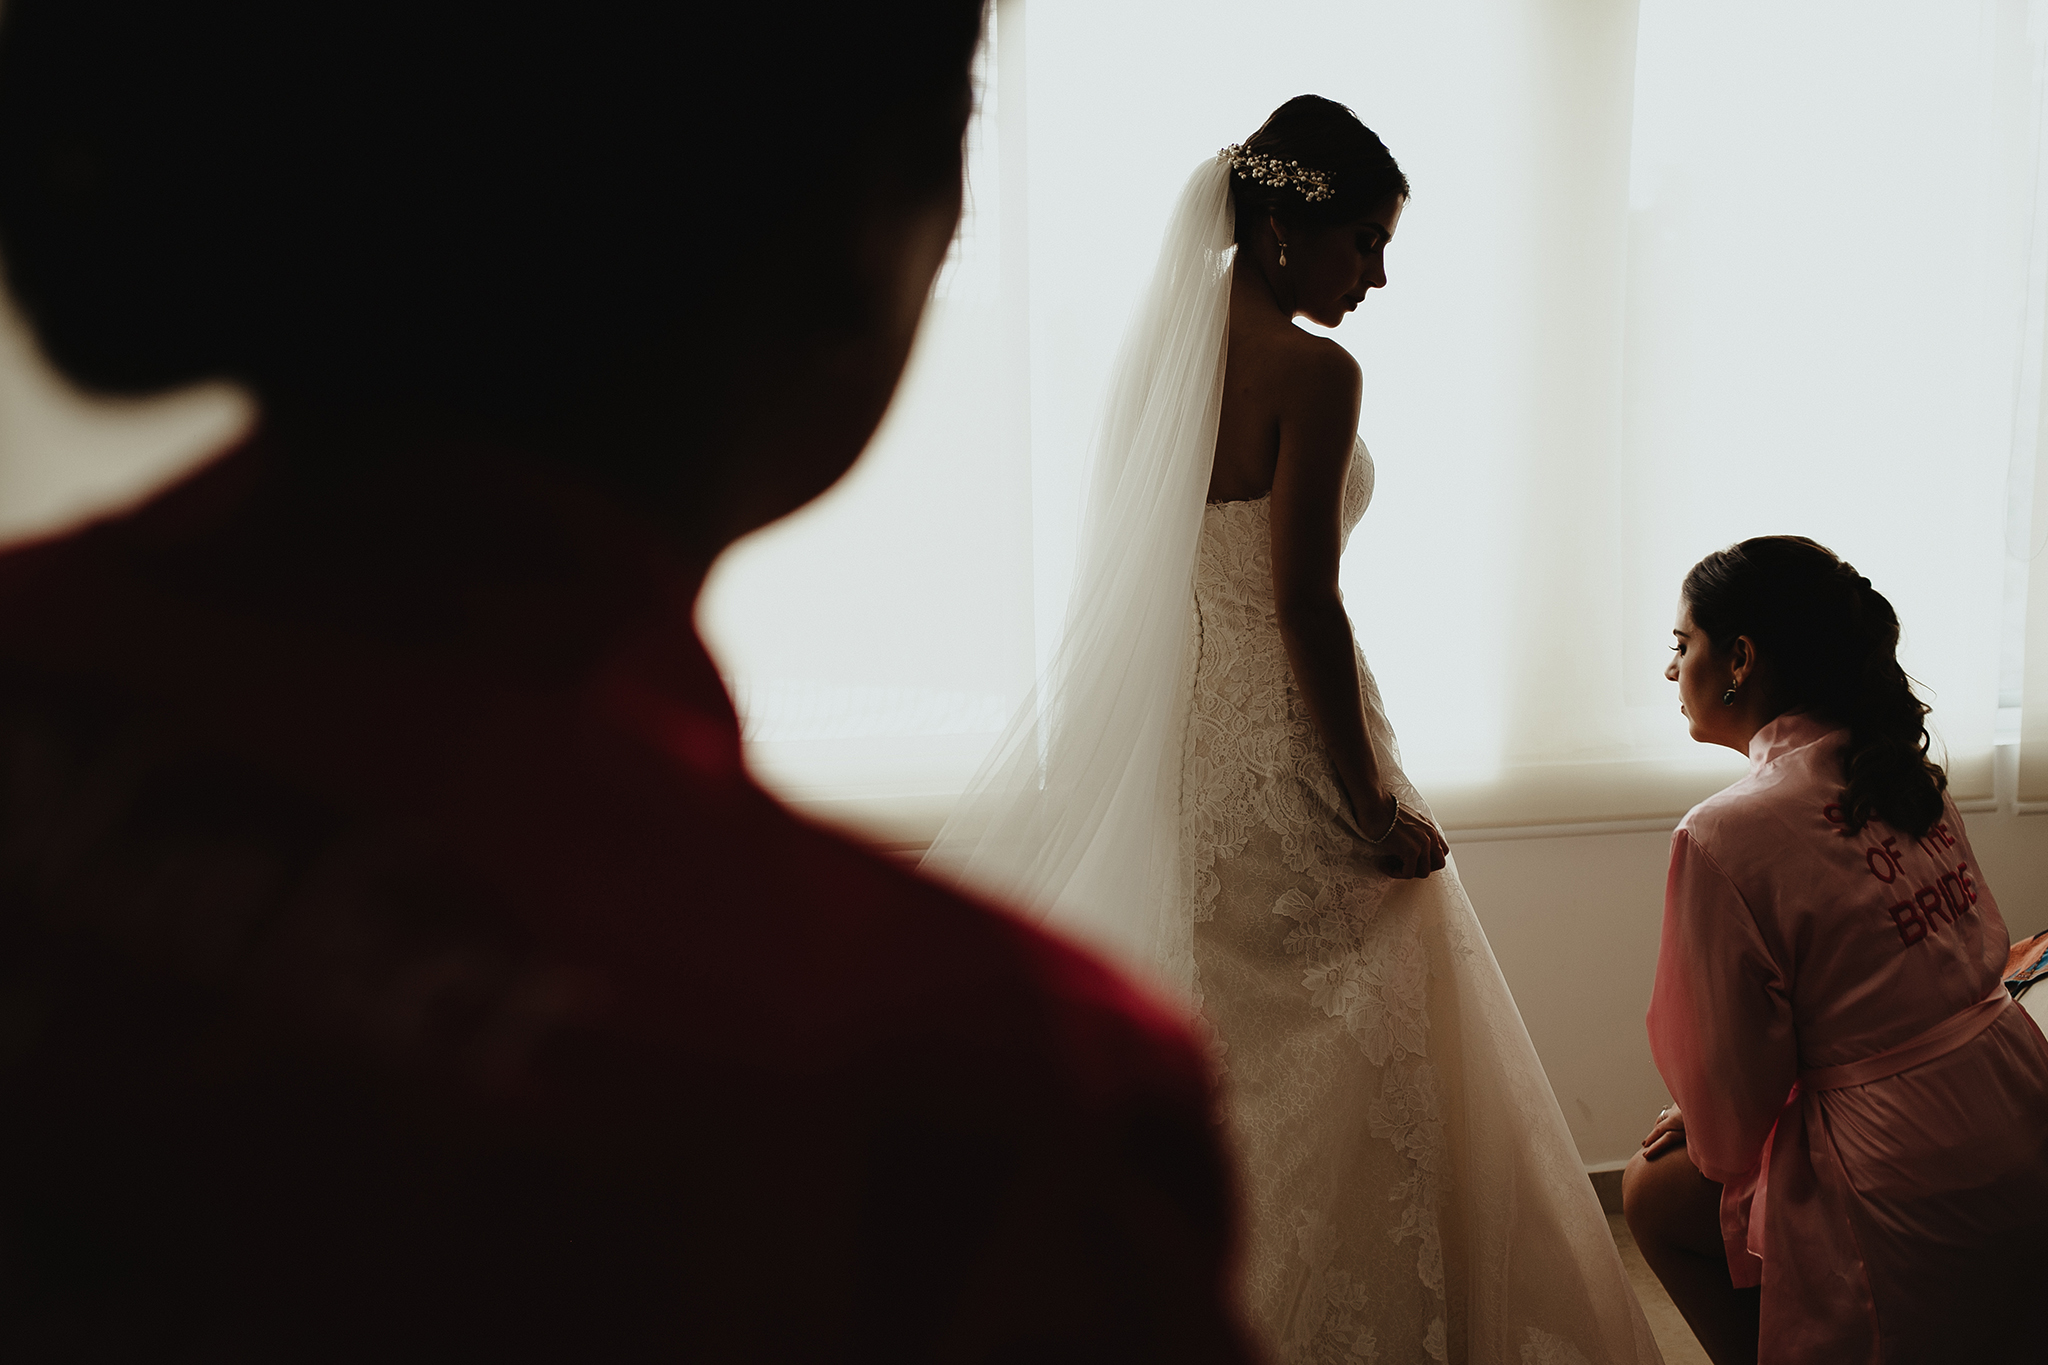 0101F&Yslide_WeddingDstination_MeridaYucatan_HaciendasMerida_BodasMexico_BodasYucatan_Boda_Destino.jpg